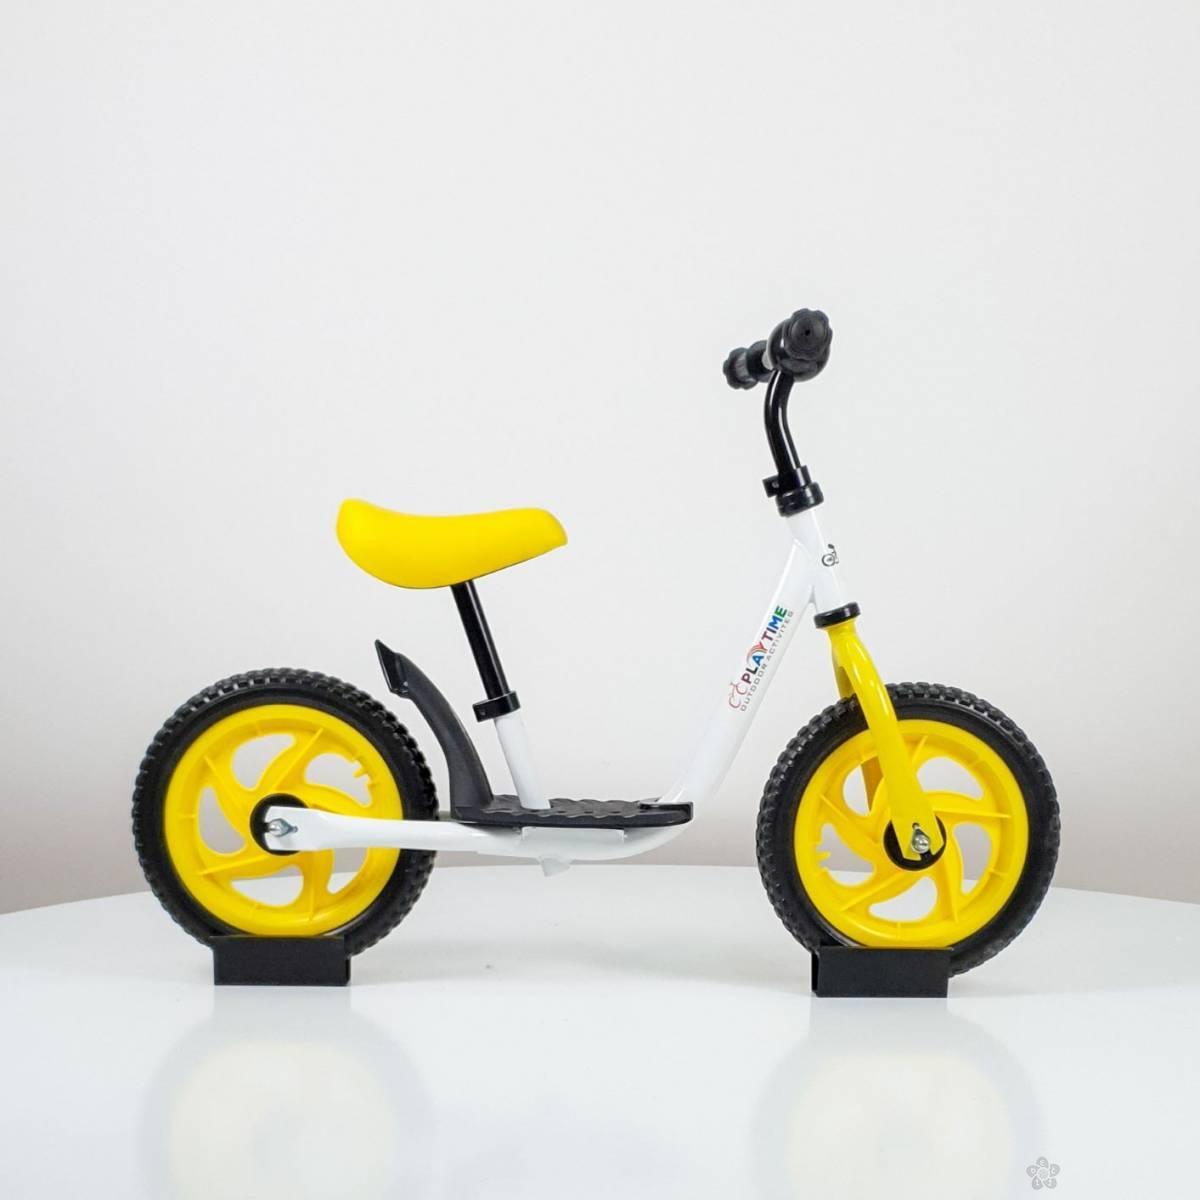 Balans bicikl model 754 žuta